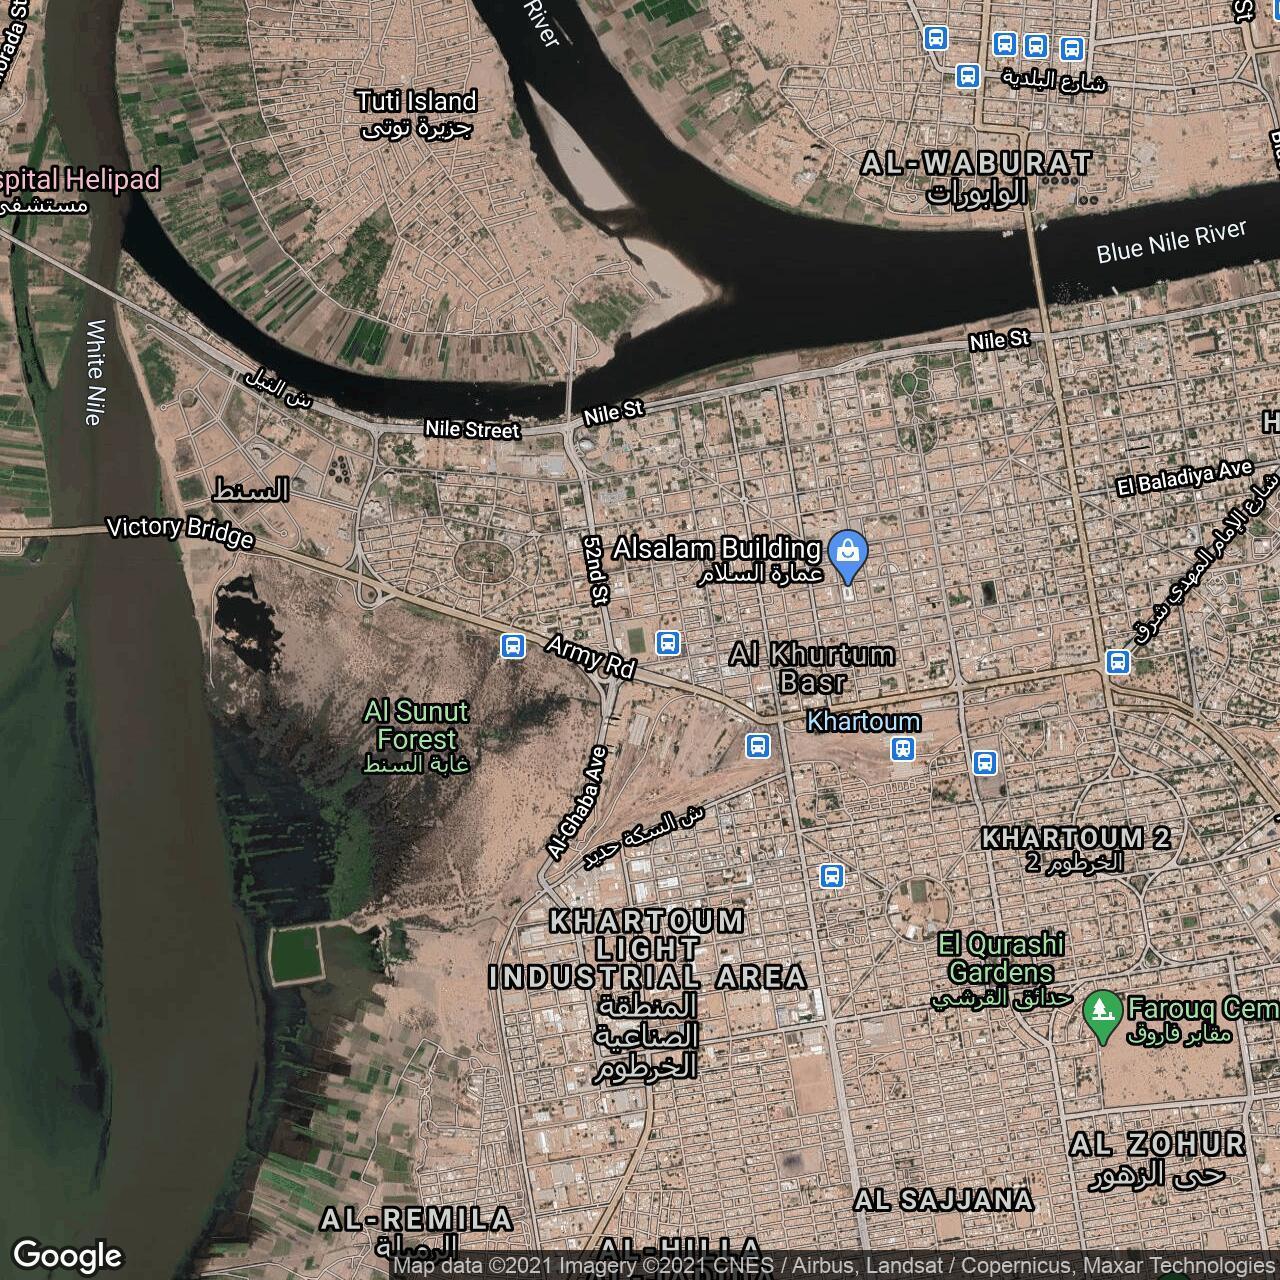 Khartoum City World Map on tikrit city map, tel aviv city map, dushanbe city map, congo river map, manama city map, port of spain city map, ramallah city map, apia city map, kumasi city map, gibraltar city map, dien bien phu city map, niger river map, aleppo city map, fortaleza city map, cotonou city map, ibadan city map, istanbul city map, zambezi river map, bulawayo city map, enugu city map,